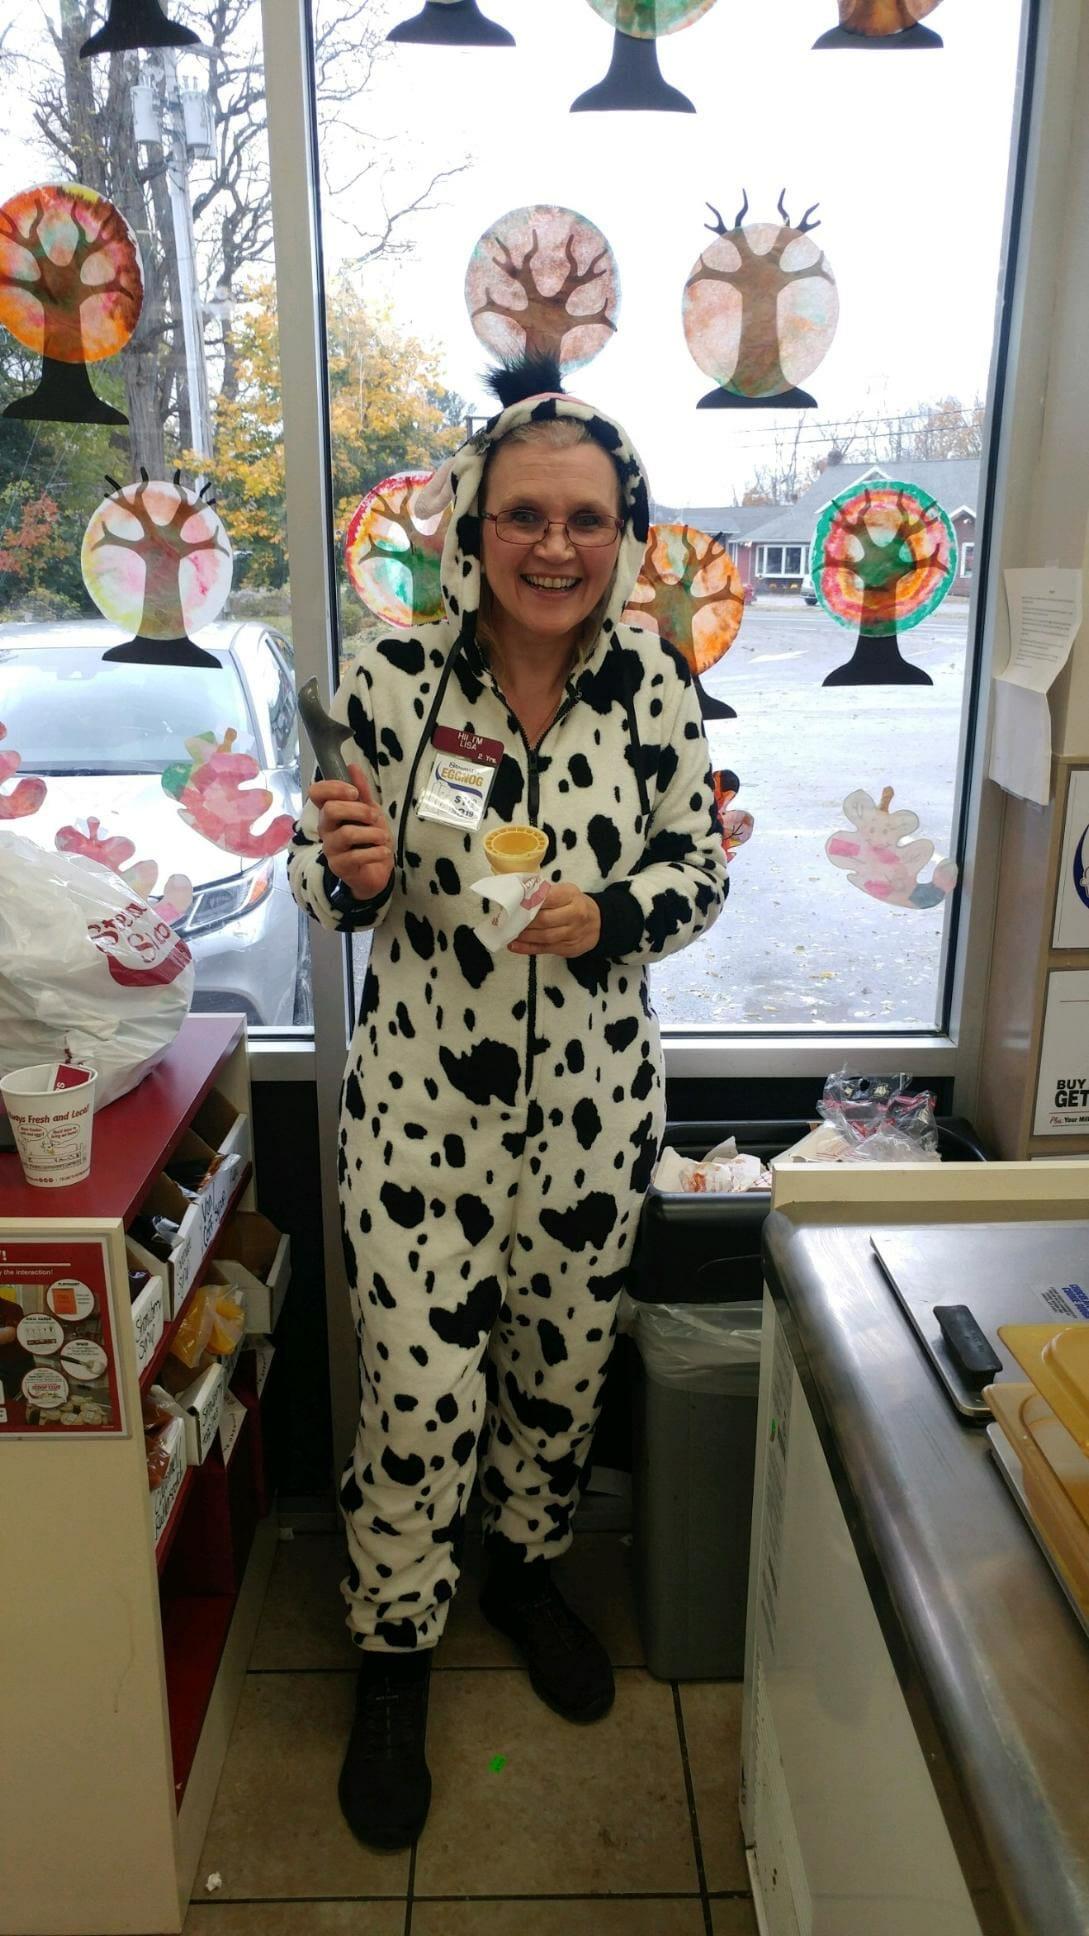 Dalmation costume for Halloween